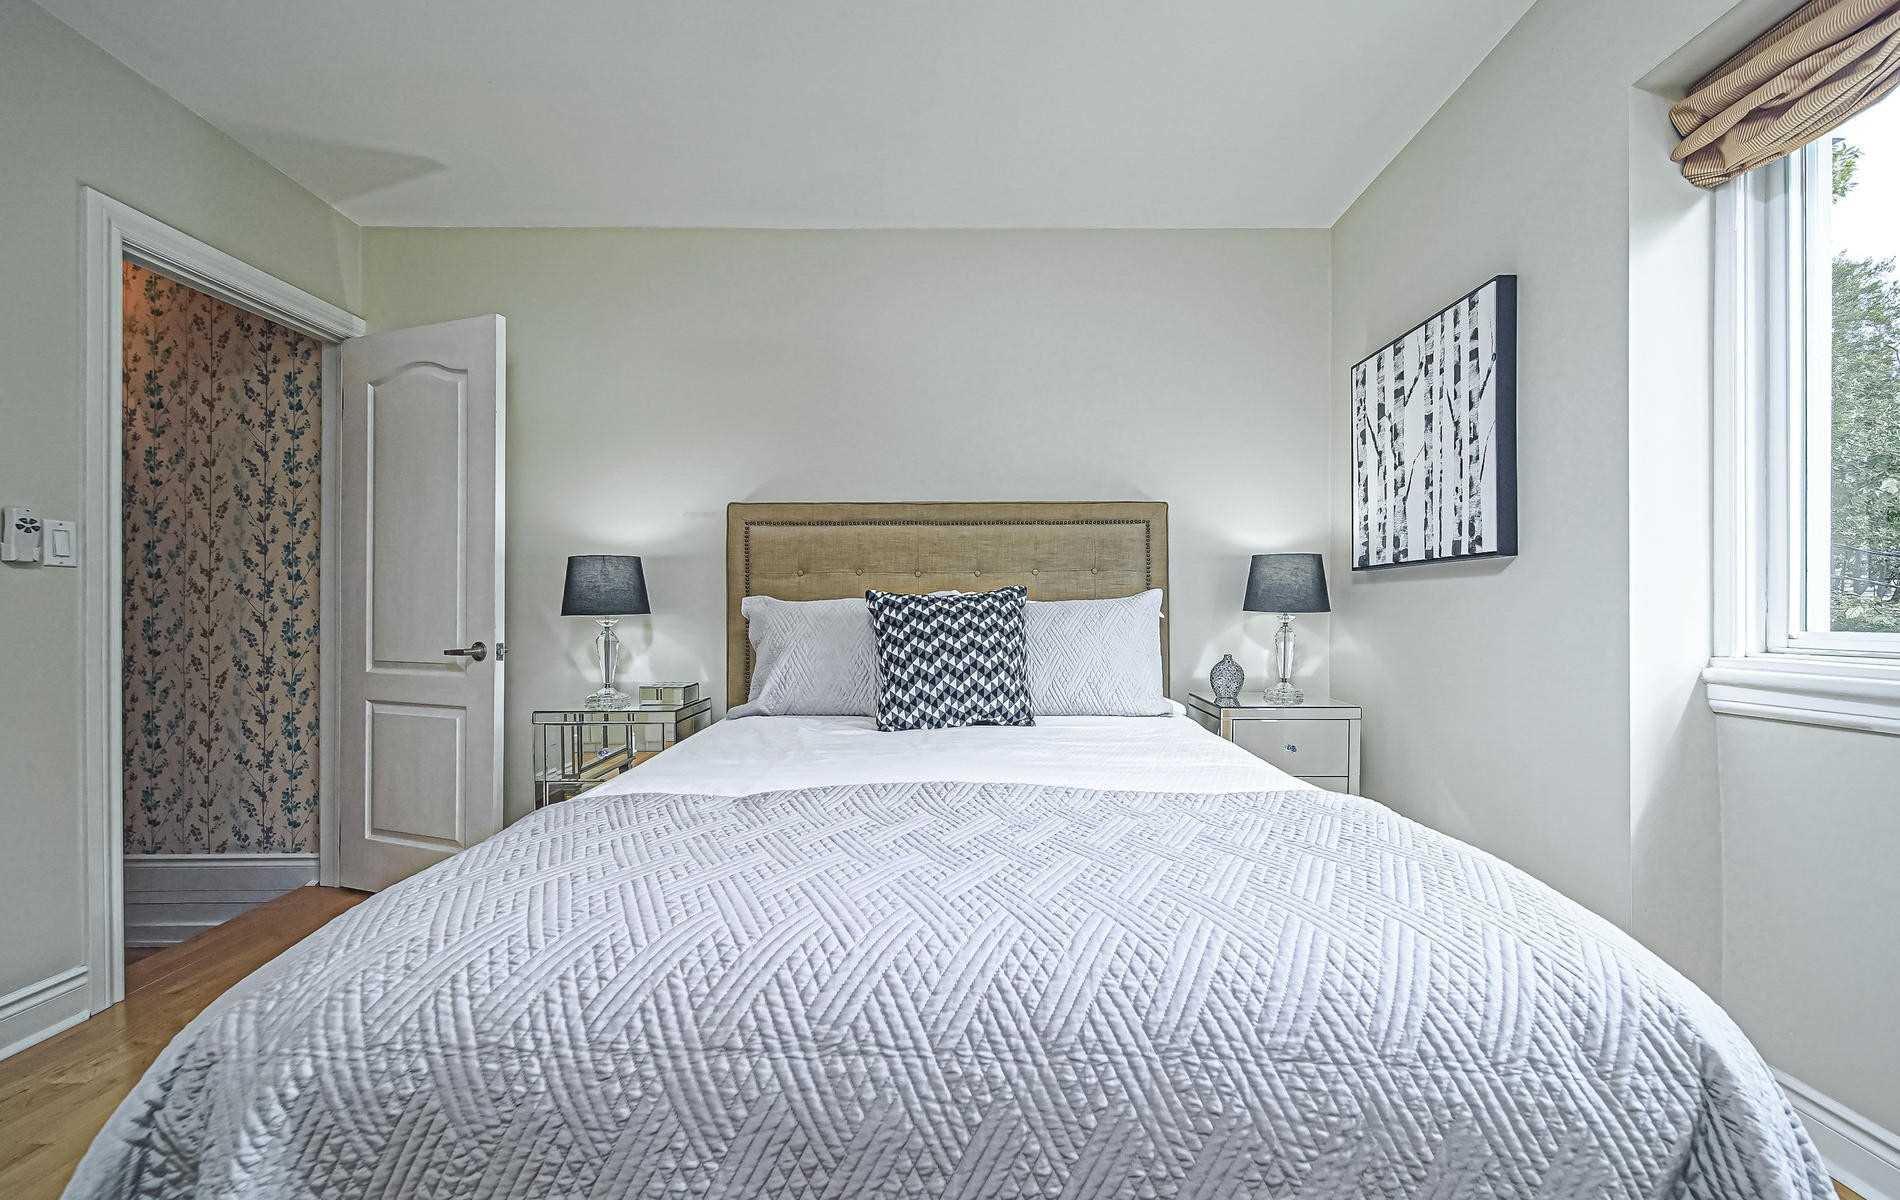 Photo 11: Photos: 84 Rushbrooke Avenue in Toronto: South Riverdale House (2-Storey) for sale (Toronto E01)  : MLS®# E4600791